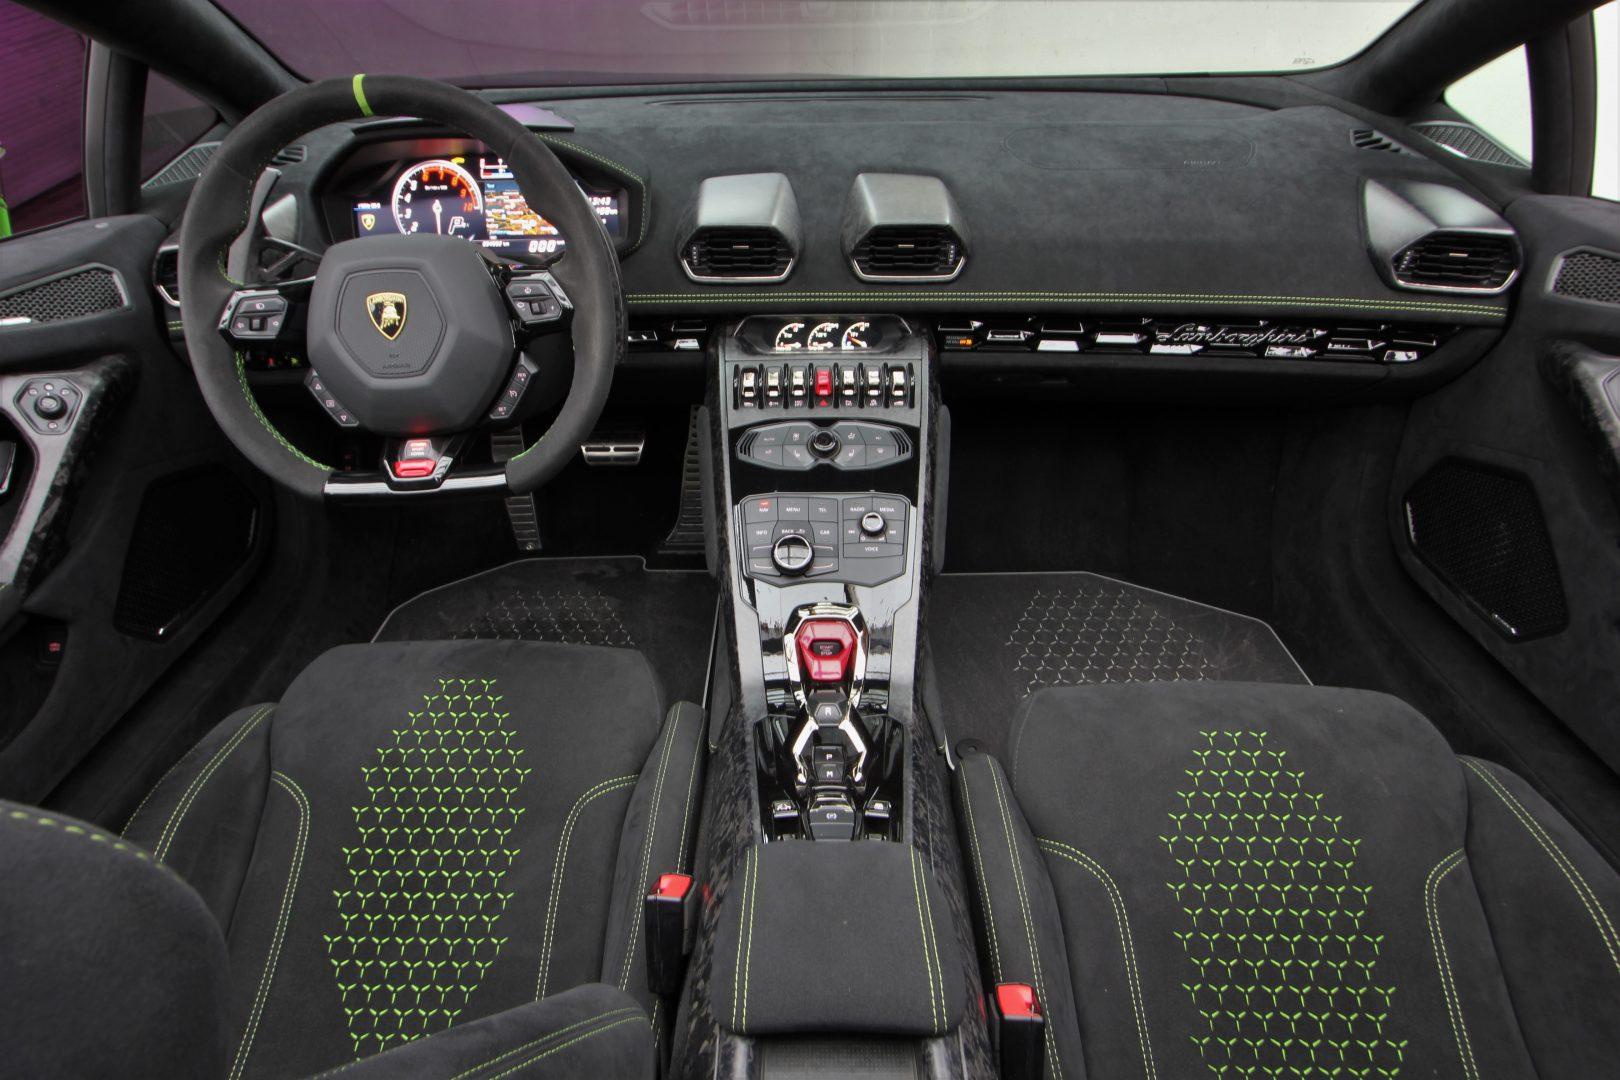 AIL Lamborghini Huracan Performante Spyder LP 640-4 Verda Mantis 16